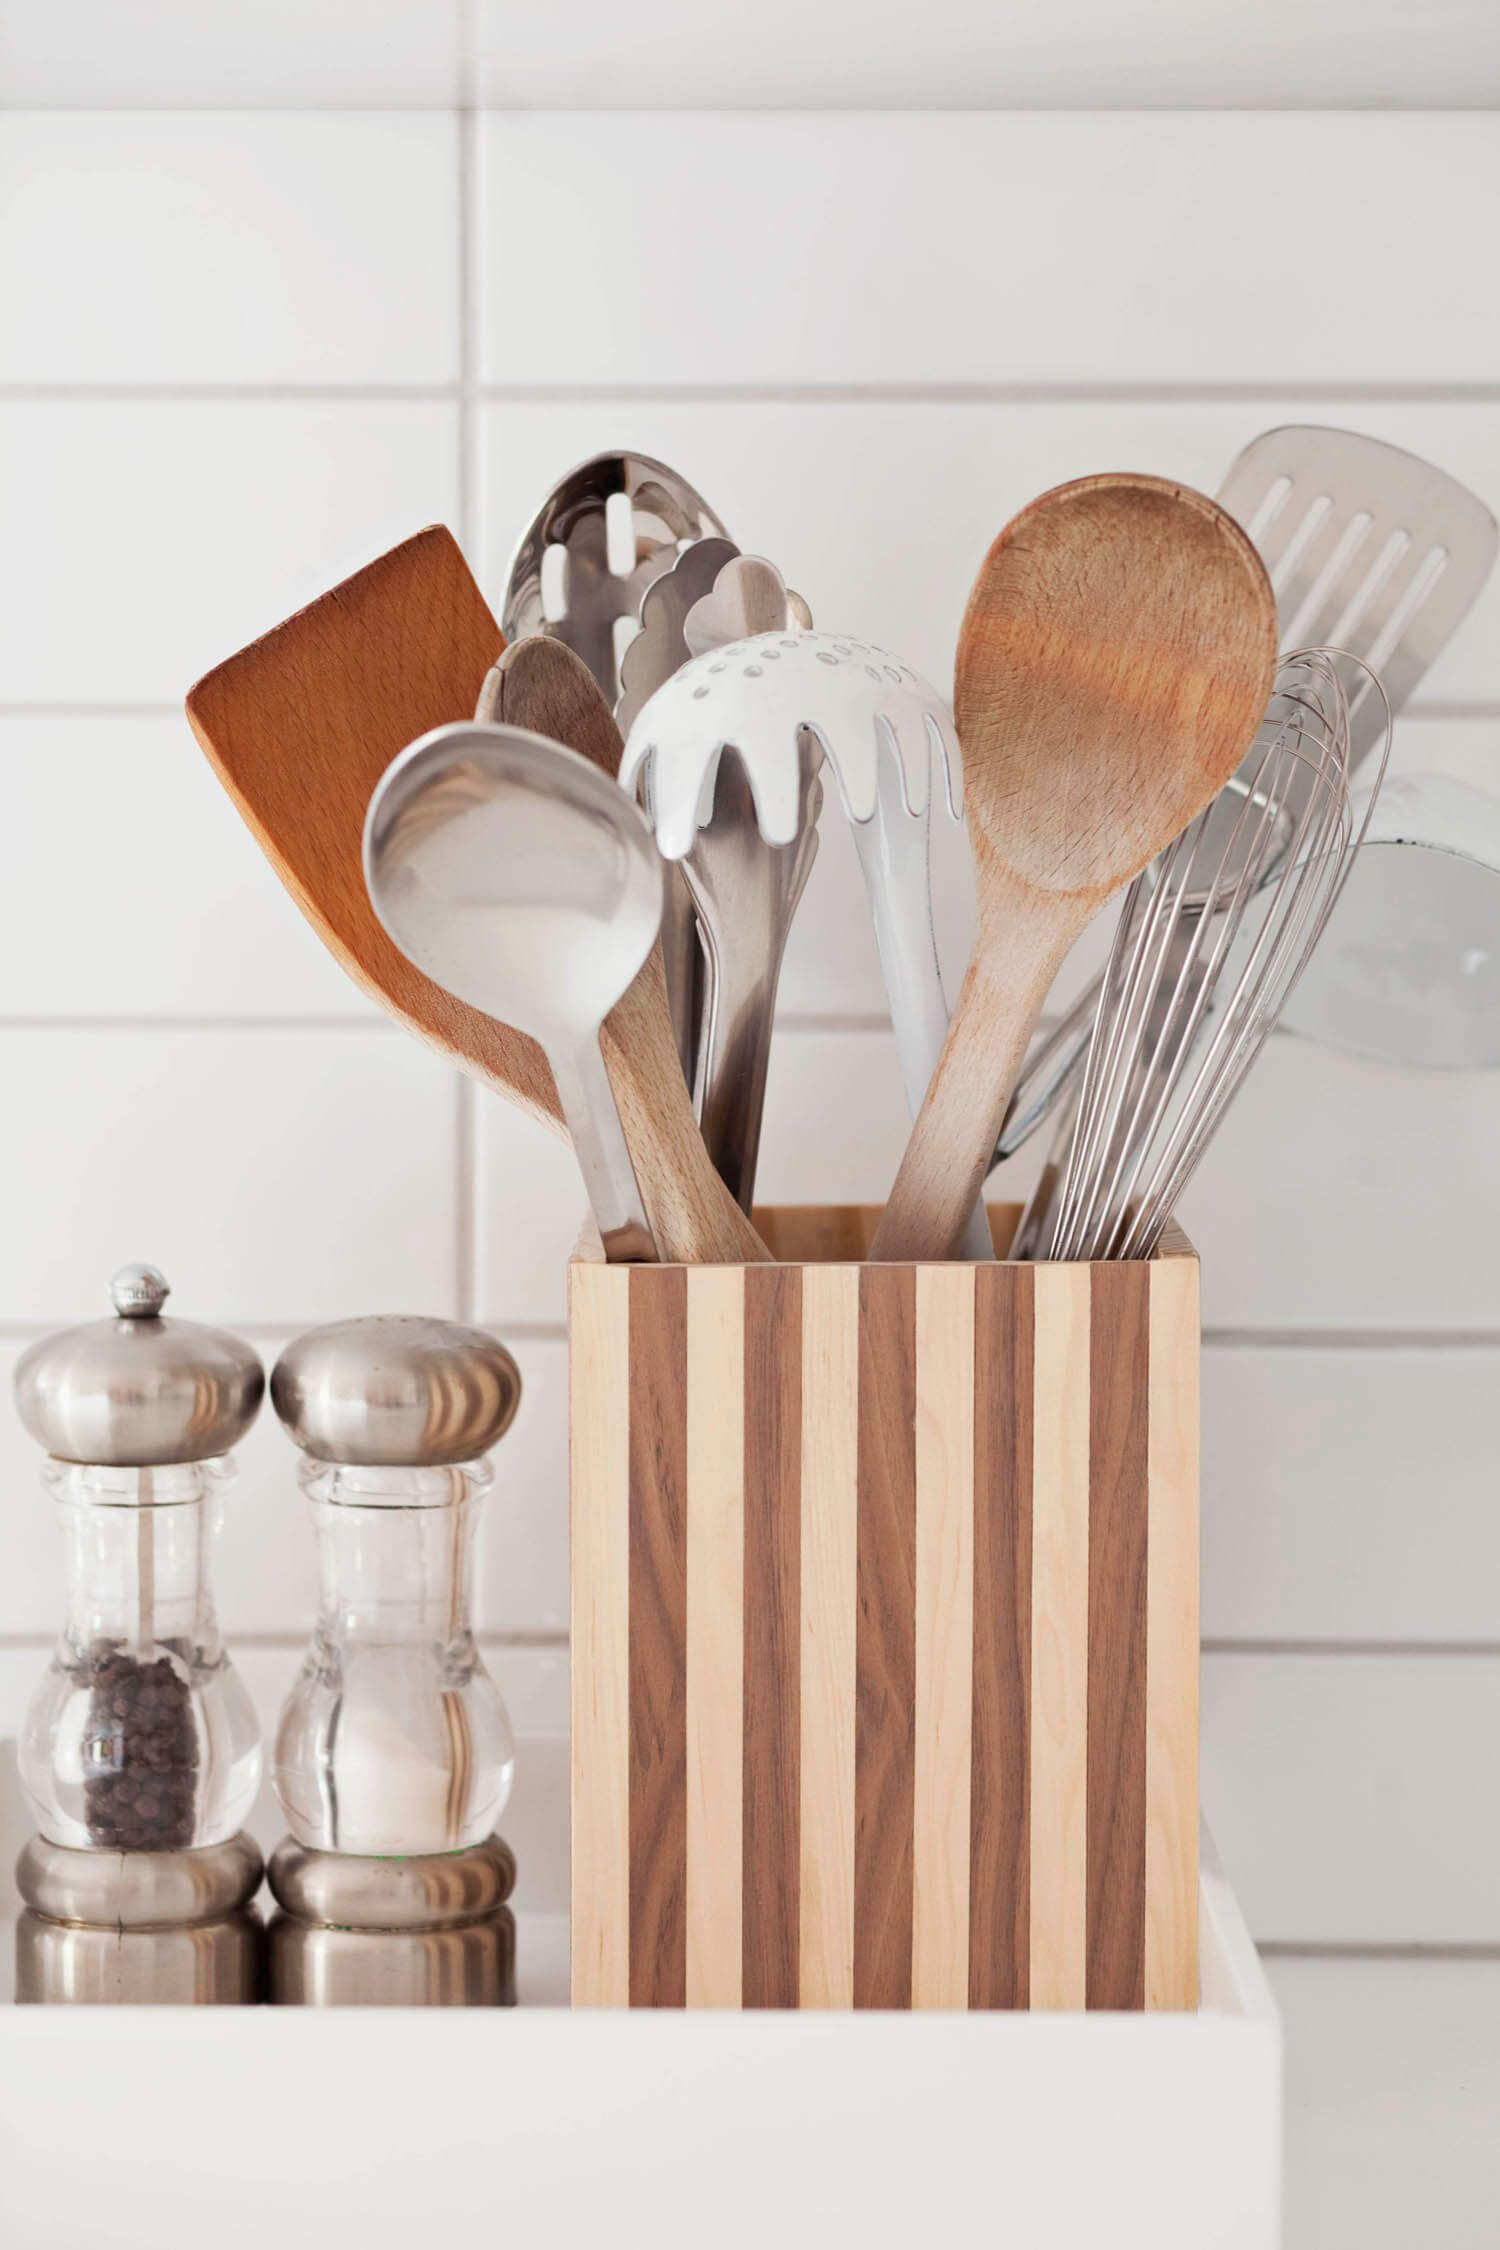 How To Make A Wood Striped Utensil Holder Diy Utensils Kitchen